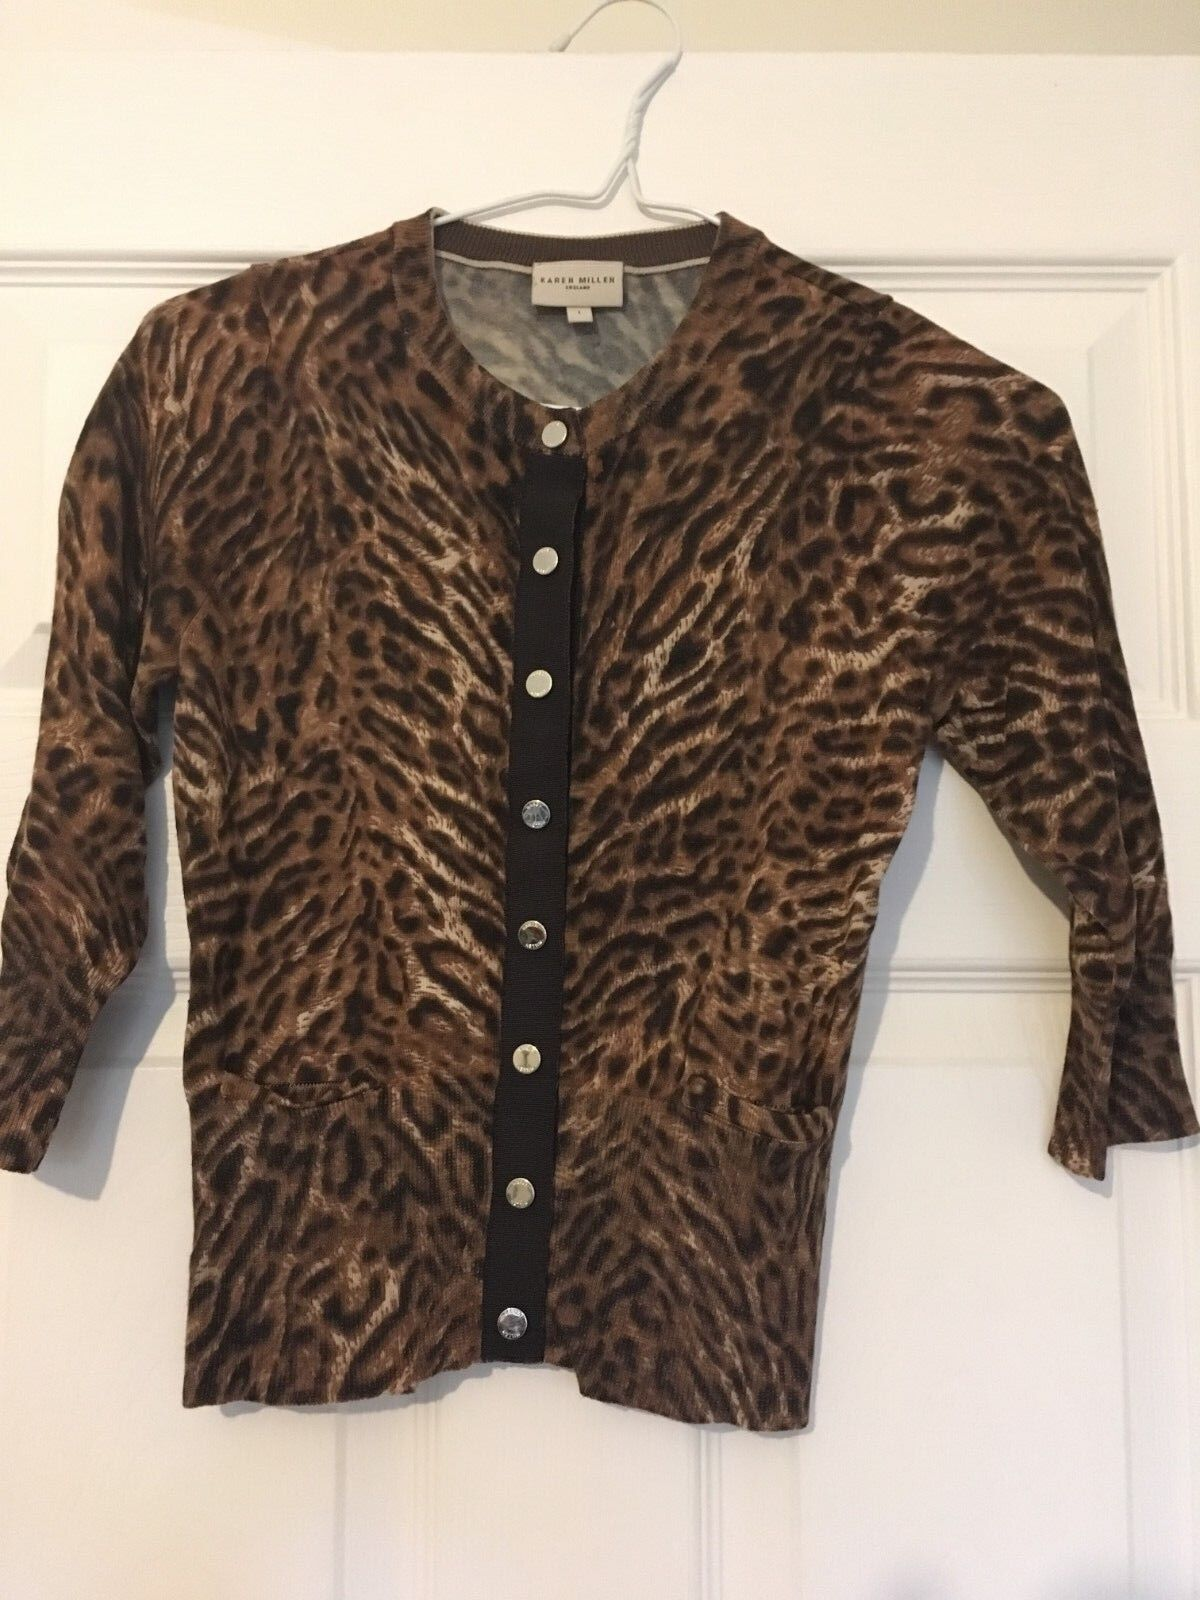 KAREN MILLEN braun leopard print cardigan with Silber buttons Größe 1(8)